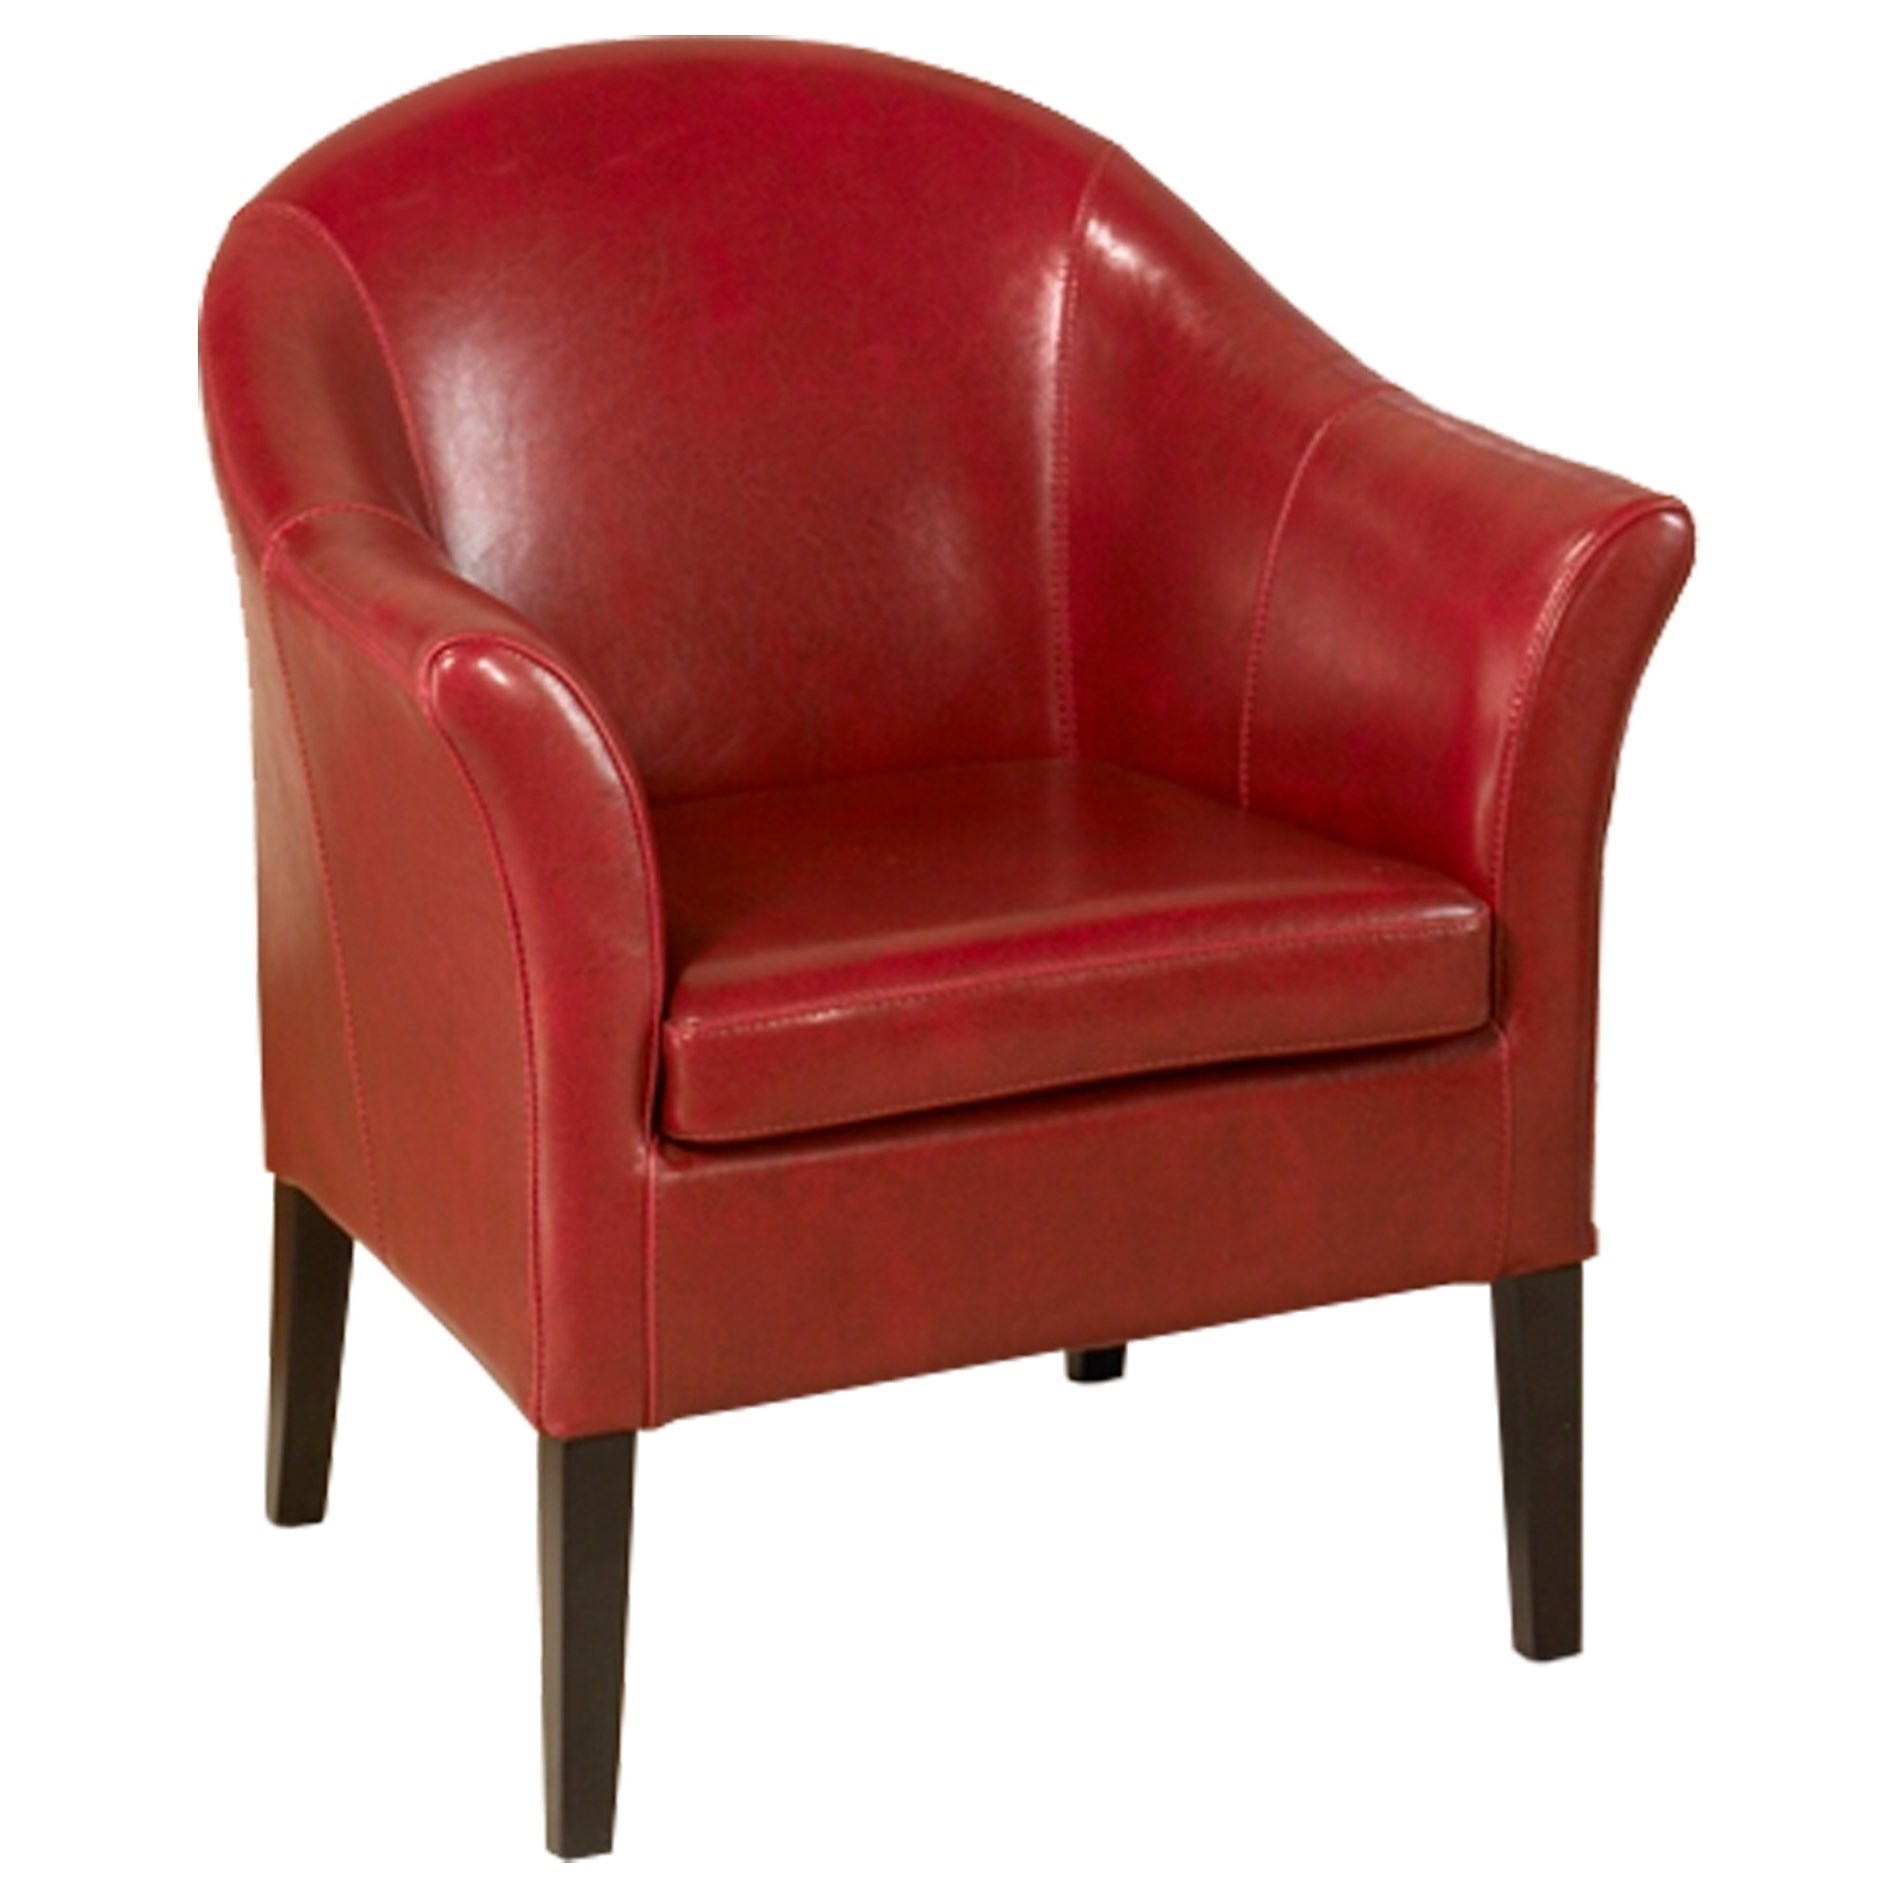 1404 Club Chair at Sadler's Home Furnishings